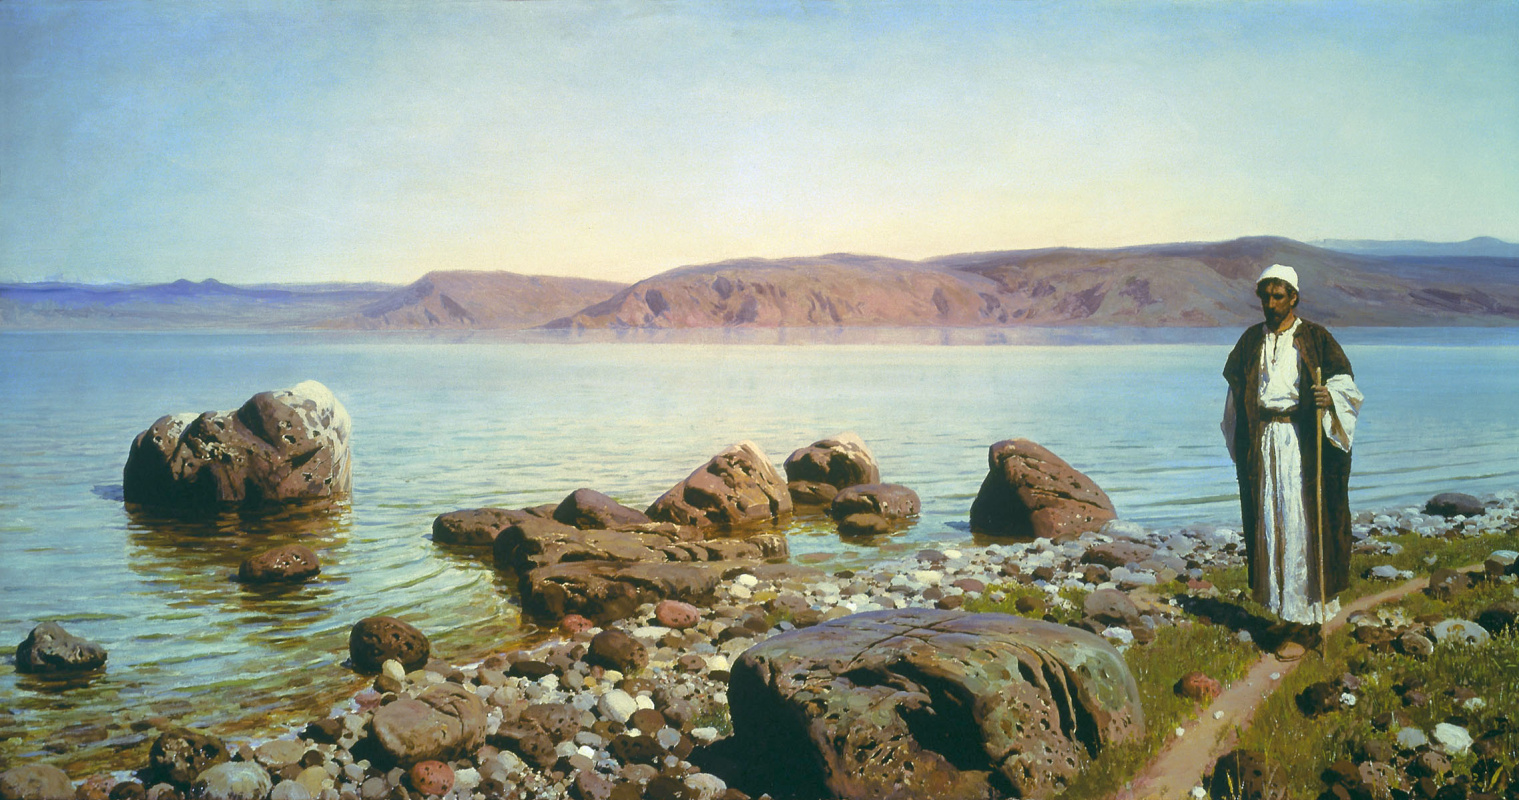 Vasily Polenov. On the sea of Galilee (Genisaretsky) lake